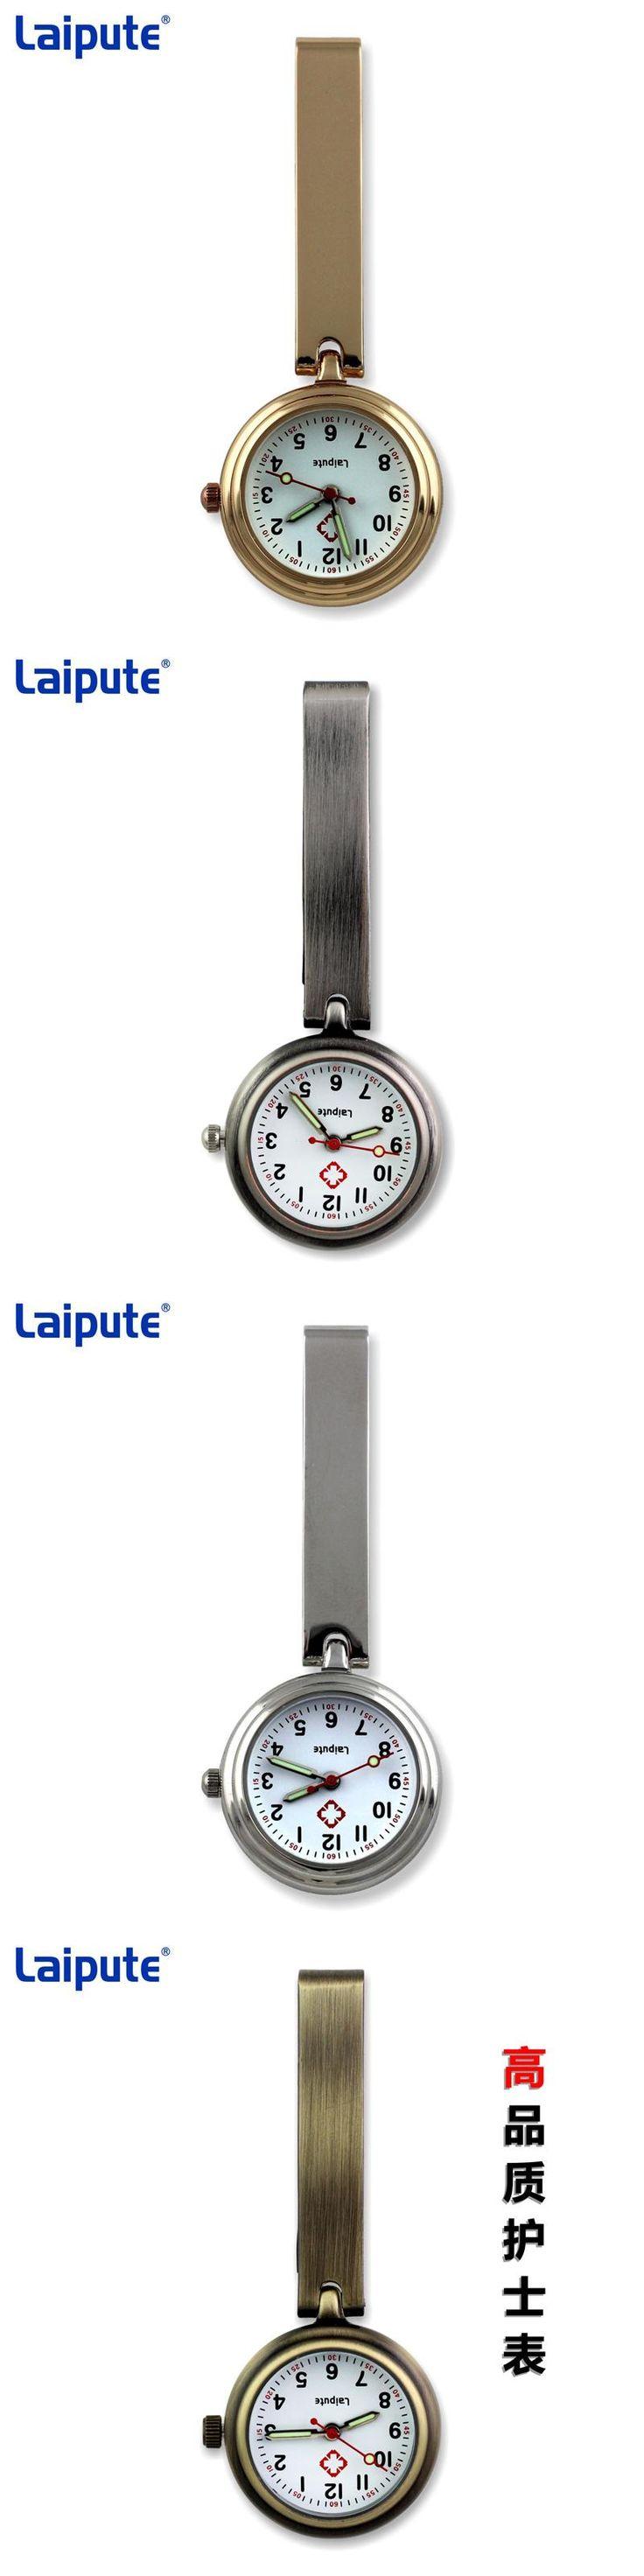 Laipute Brand New Keychain Nurse Watches FOB Doctor Quartz Hanging Pocket Watch Relog Luminous Hands Zakhorloge Montre